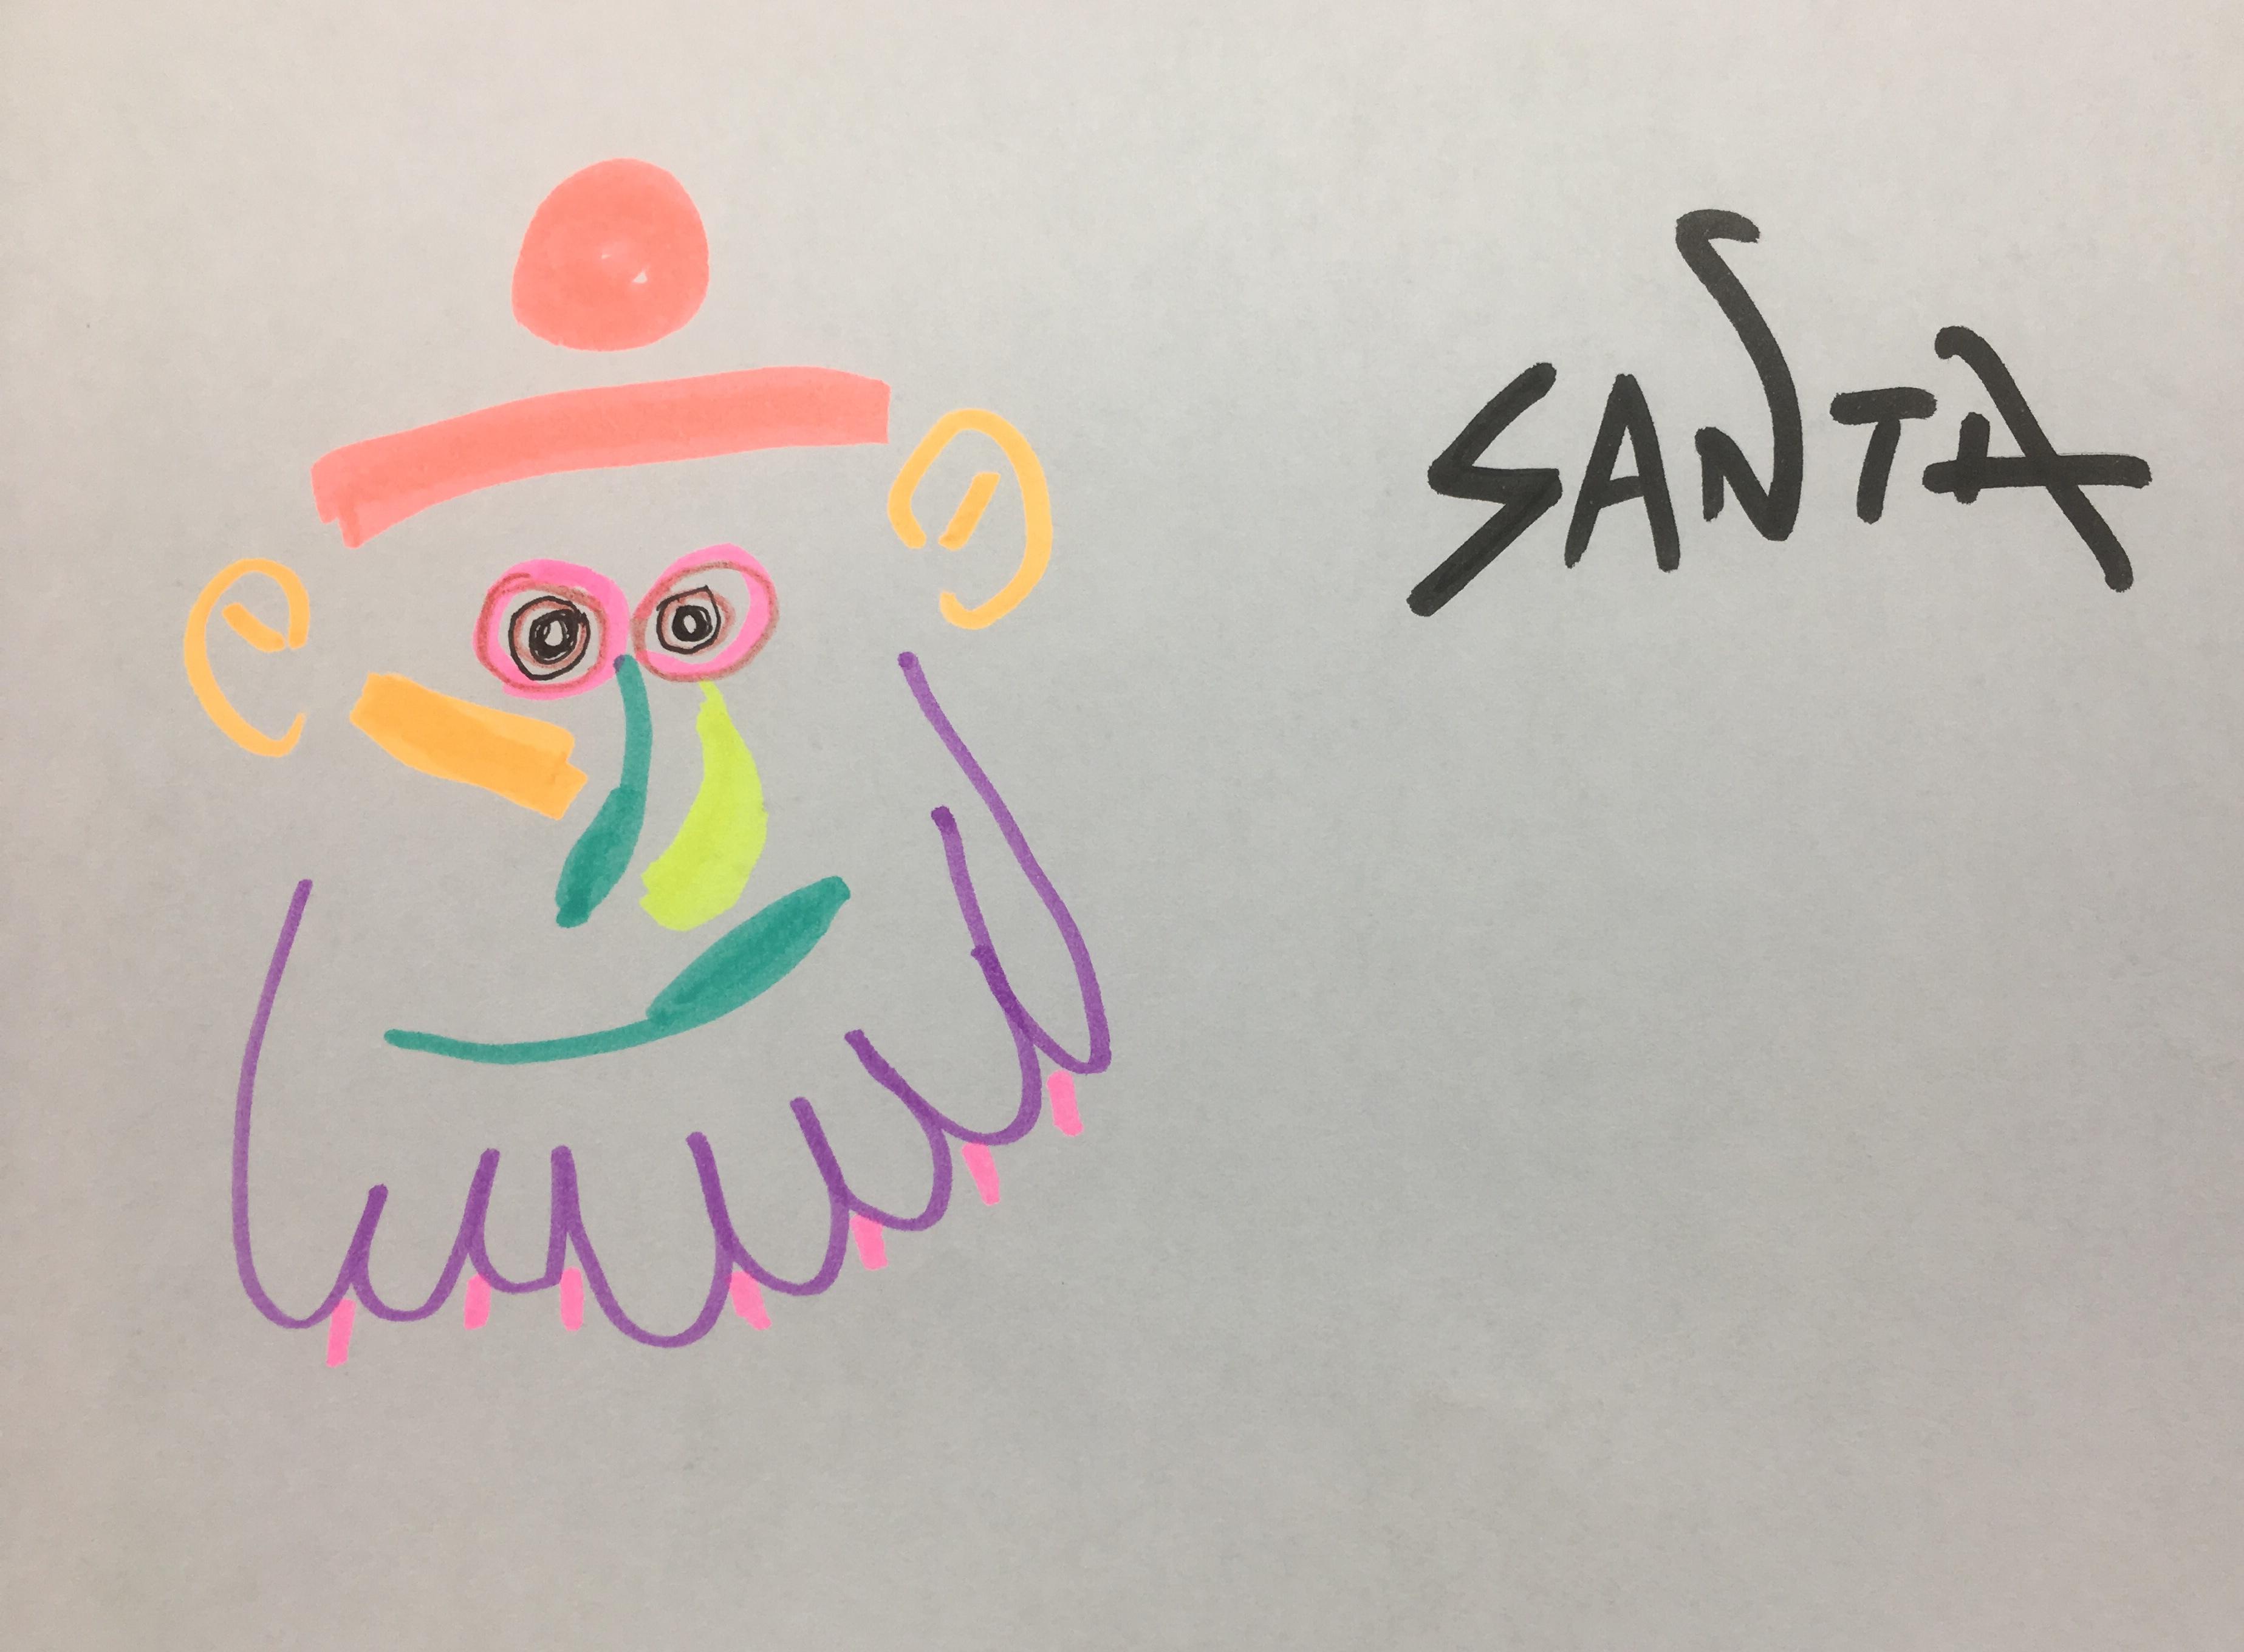 Santa after Picasso - cartoon.